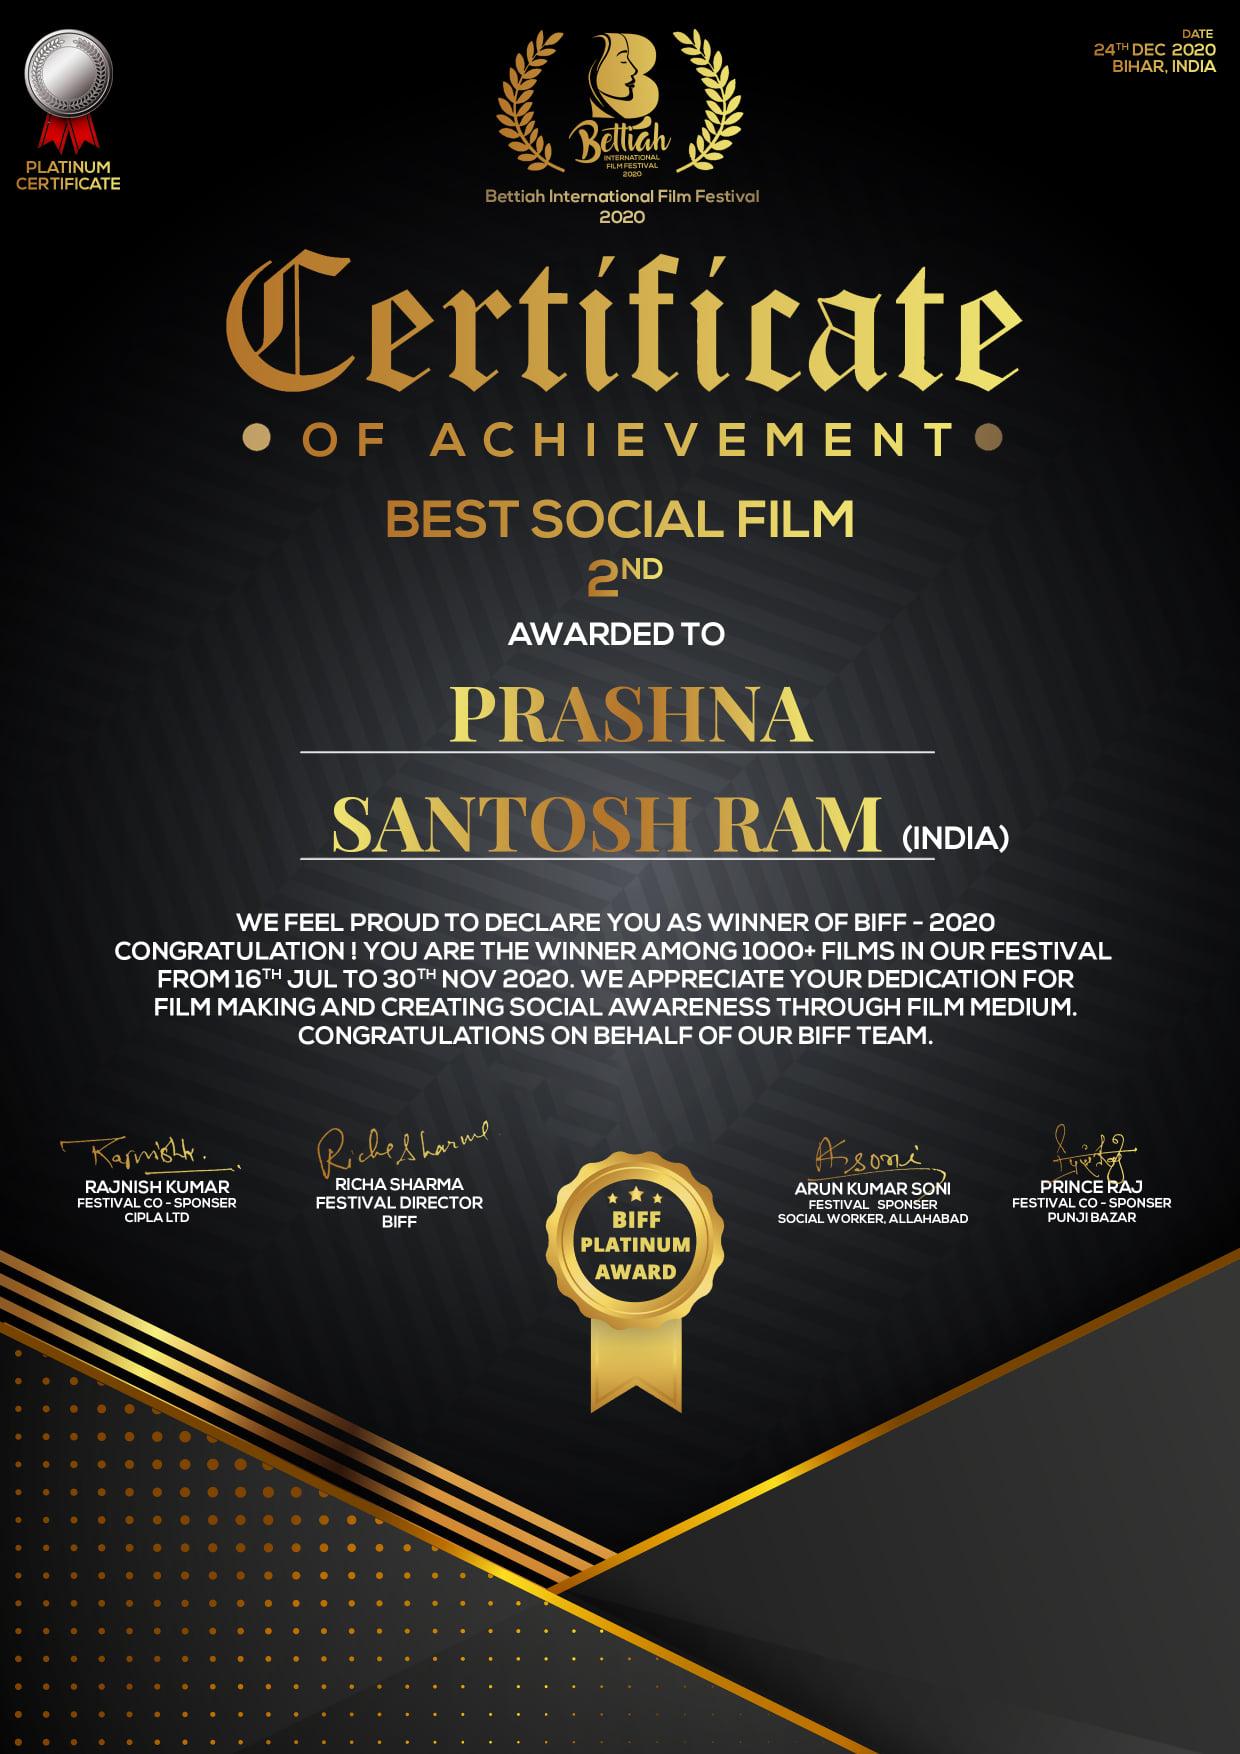 Prashna (QUESTION) Best Short Film